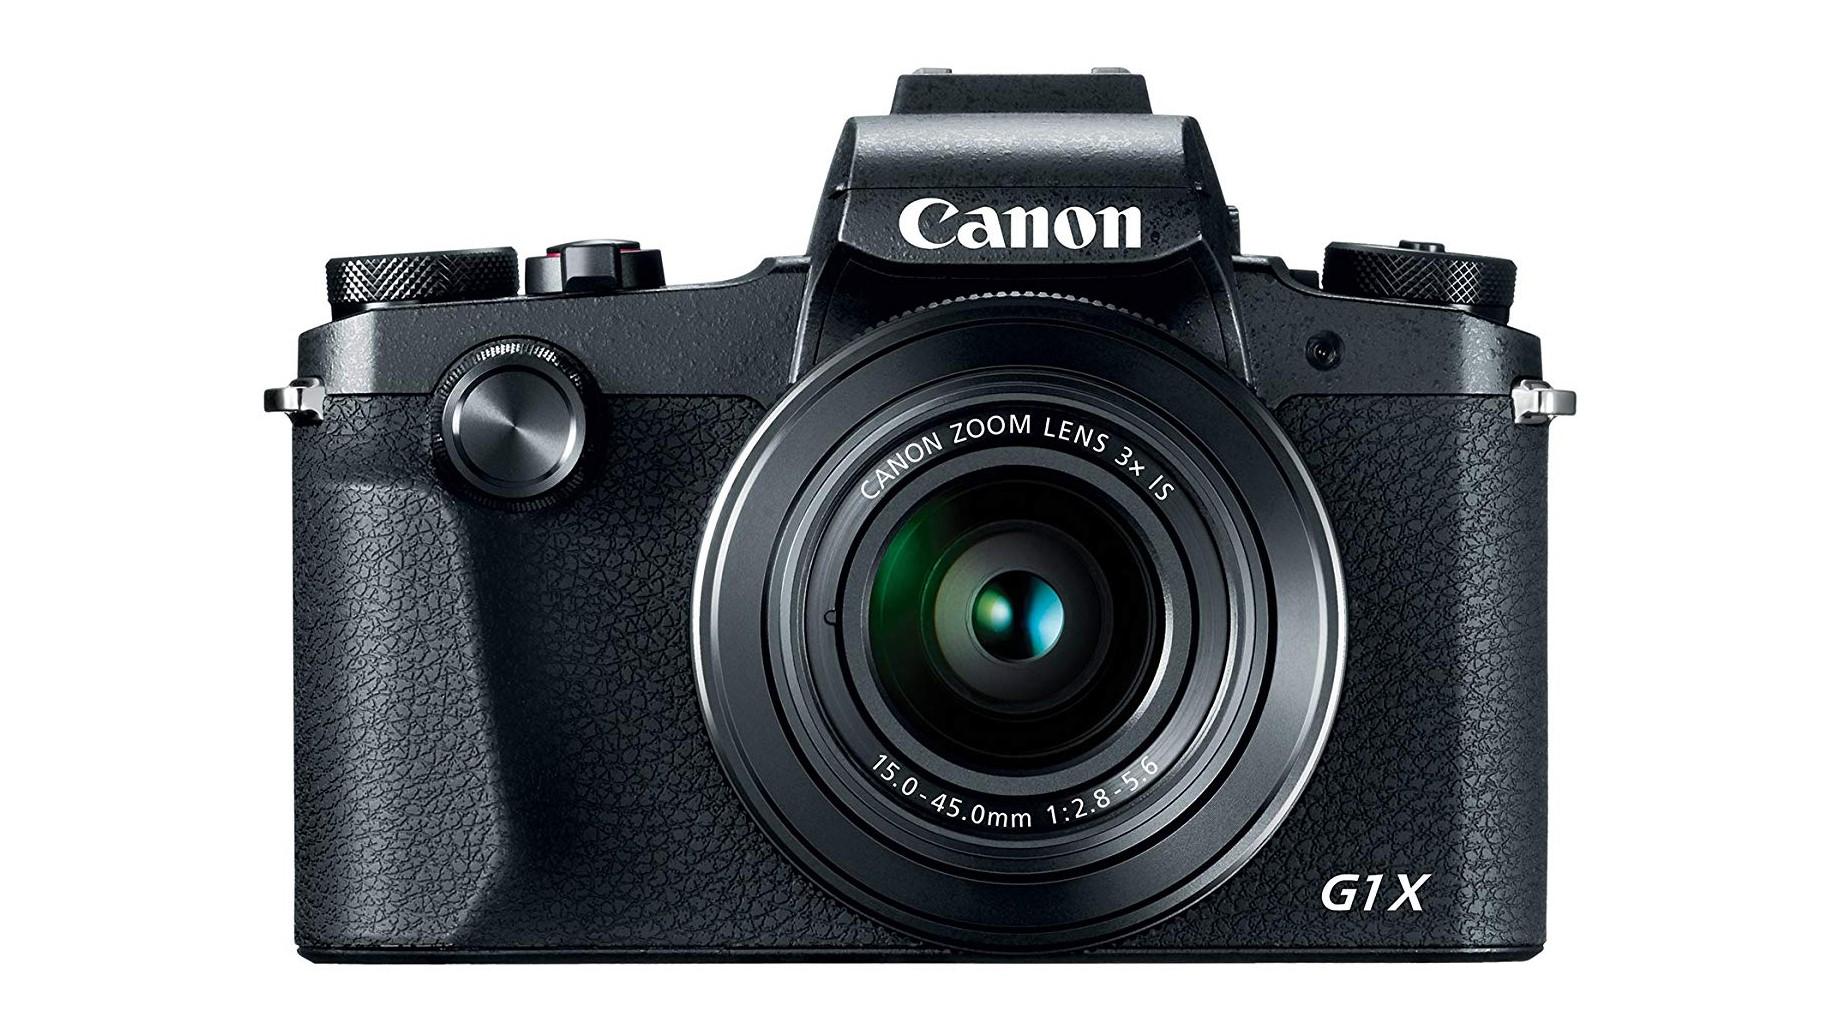 Canon Powershot G1 X Mark III point and shoot camera